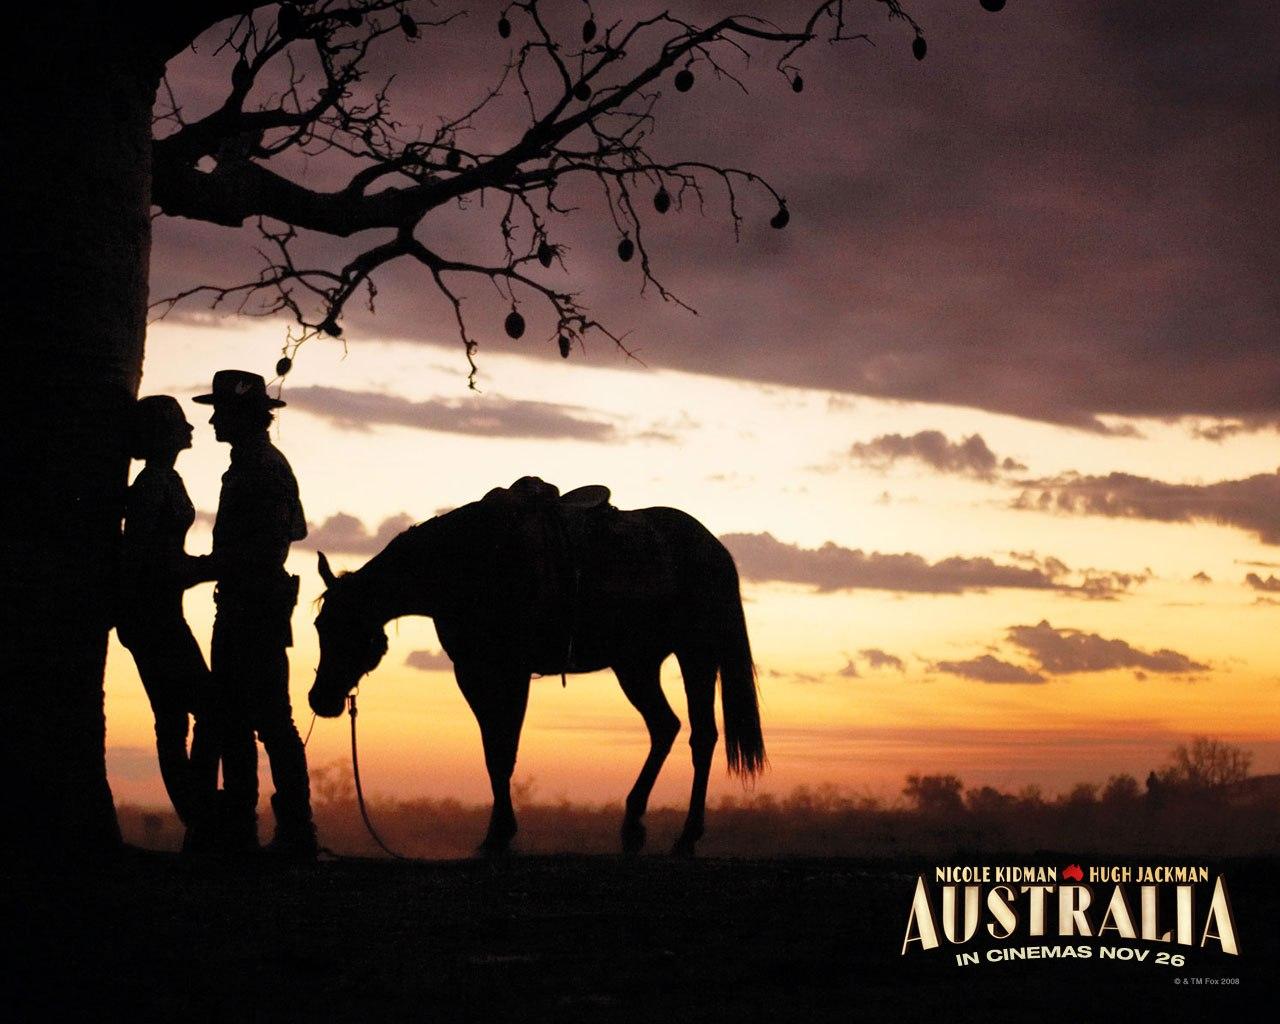 Australia de Baz Luhrmann